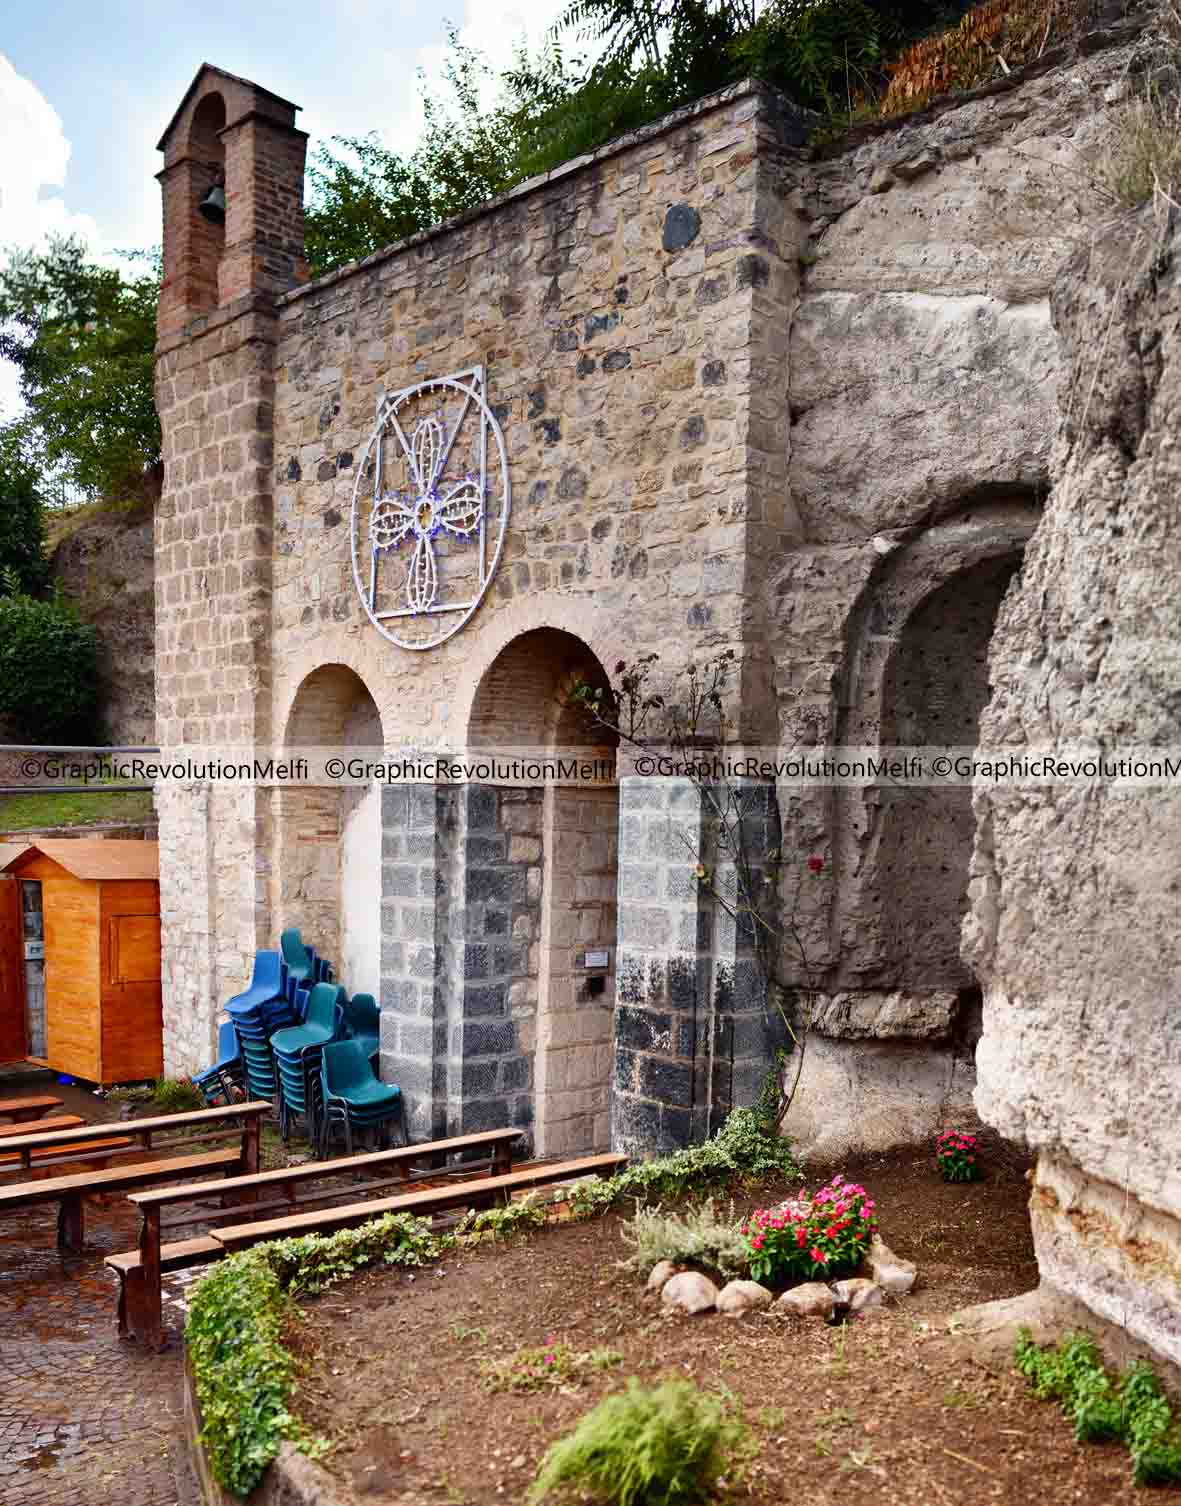 papa urbano spinelle melfi chiesa rupestre madonna